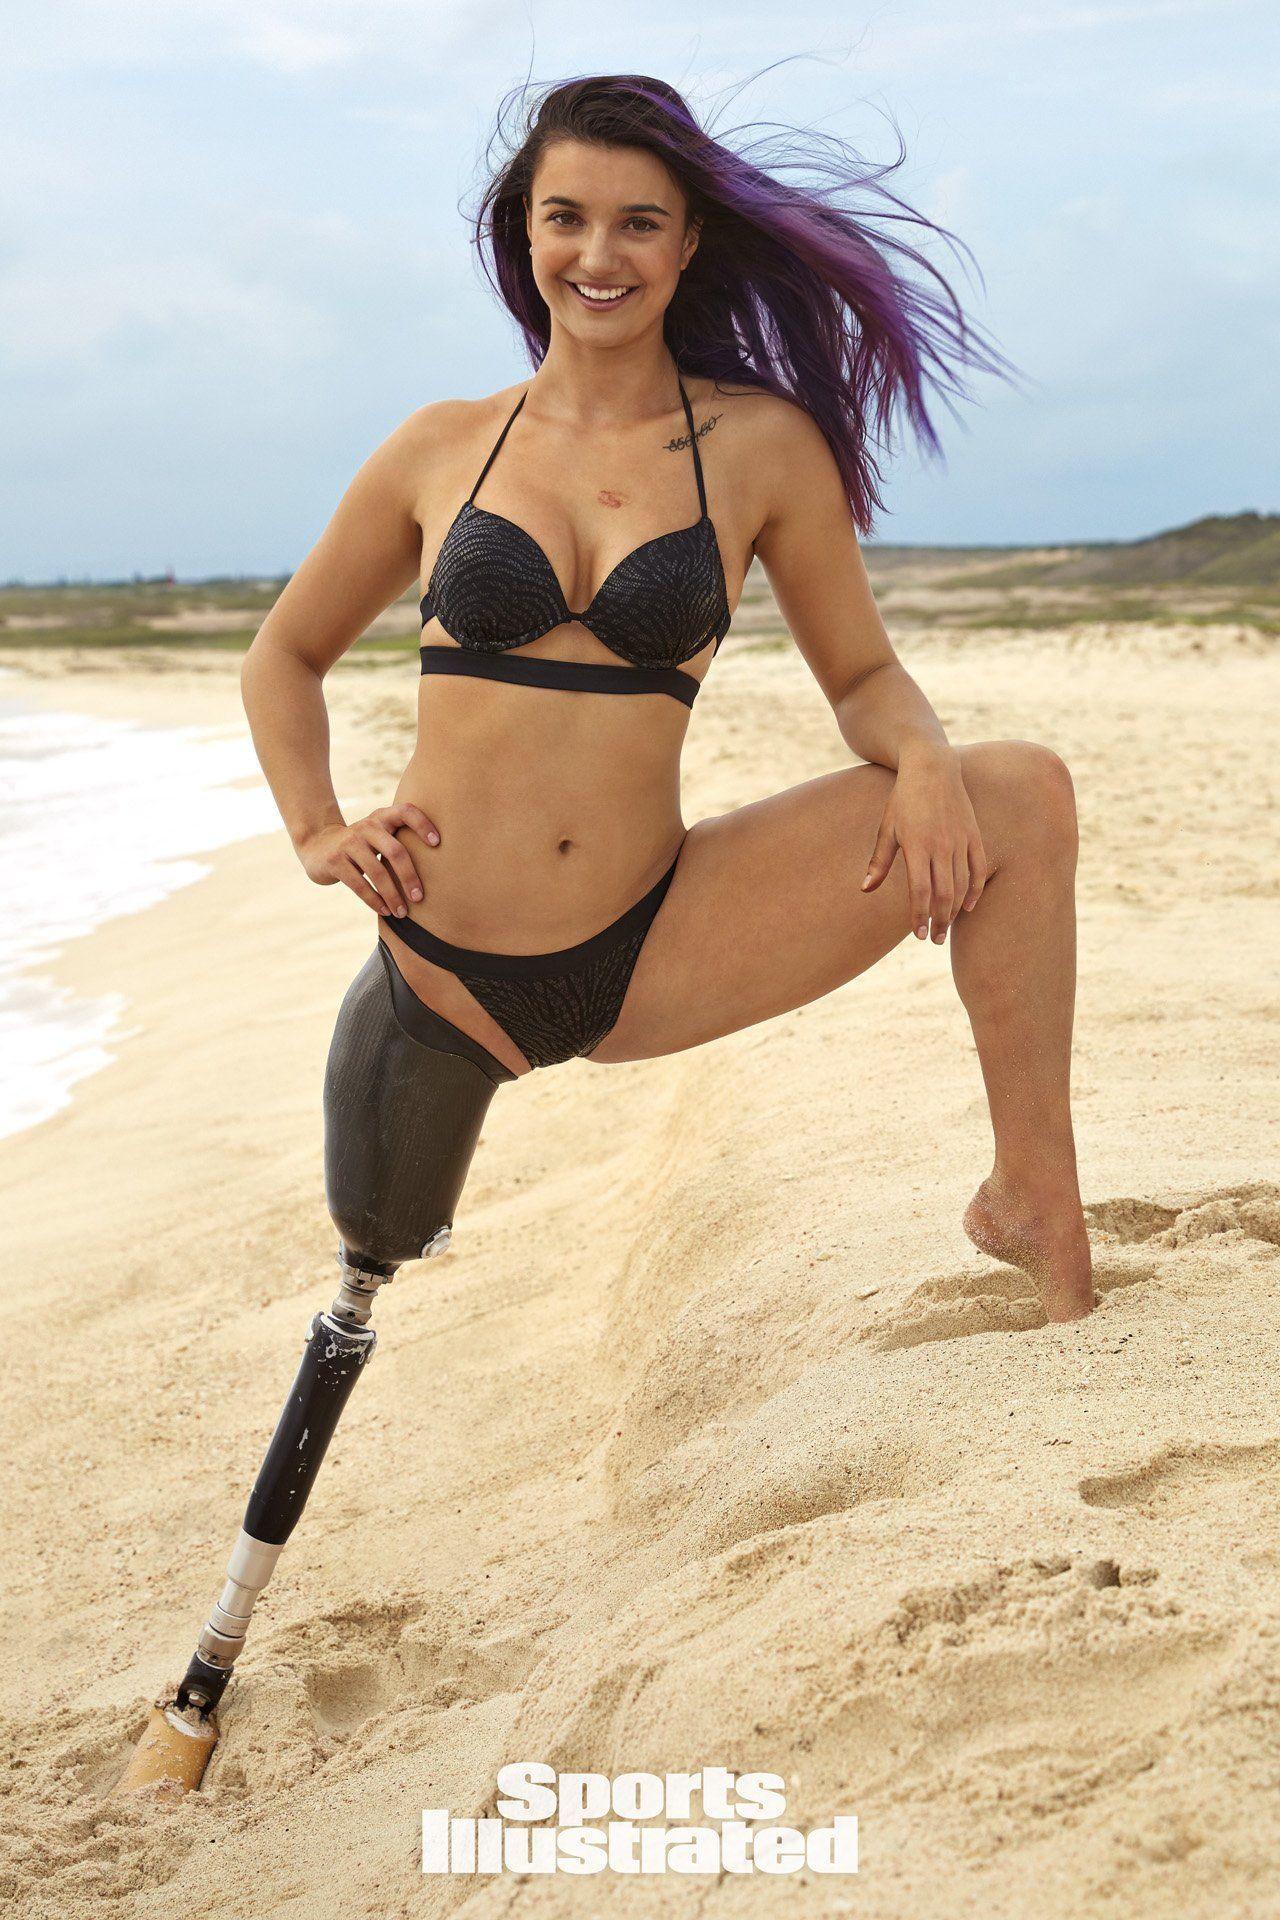 Brenna Huckaby - SI Swimsuit Issue 2018 • CelebMafia